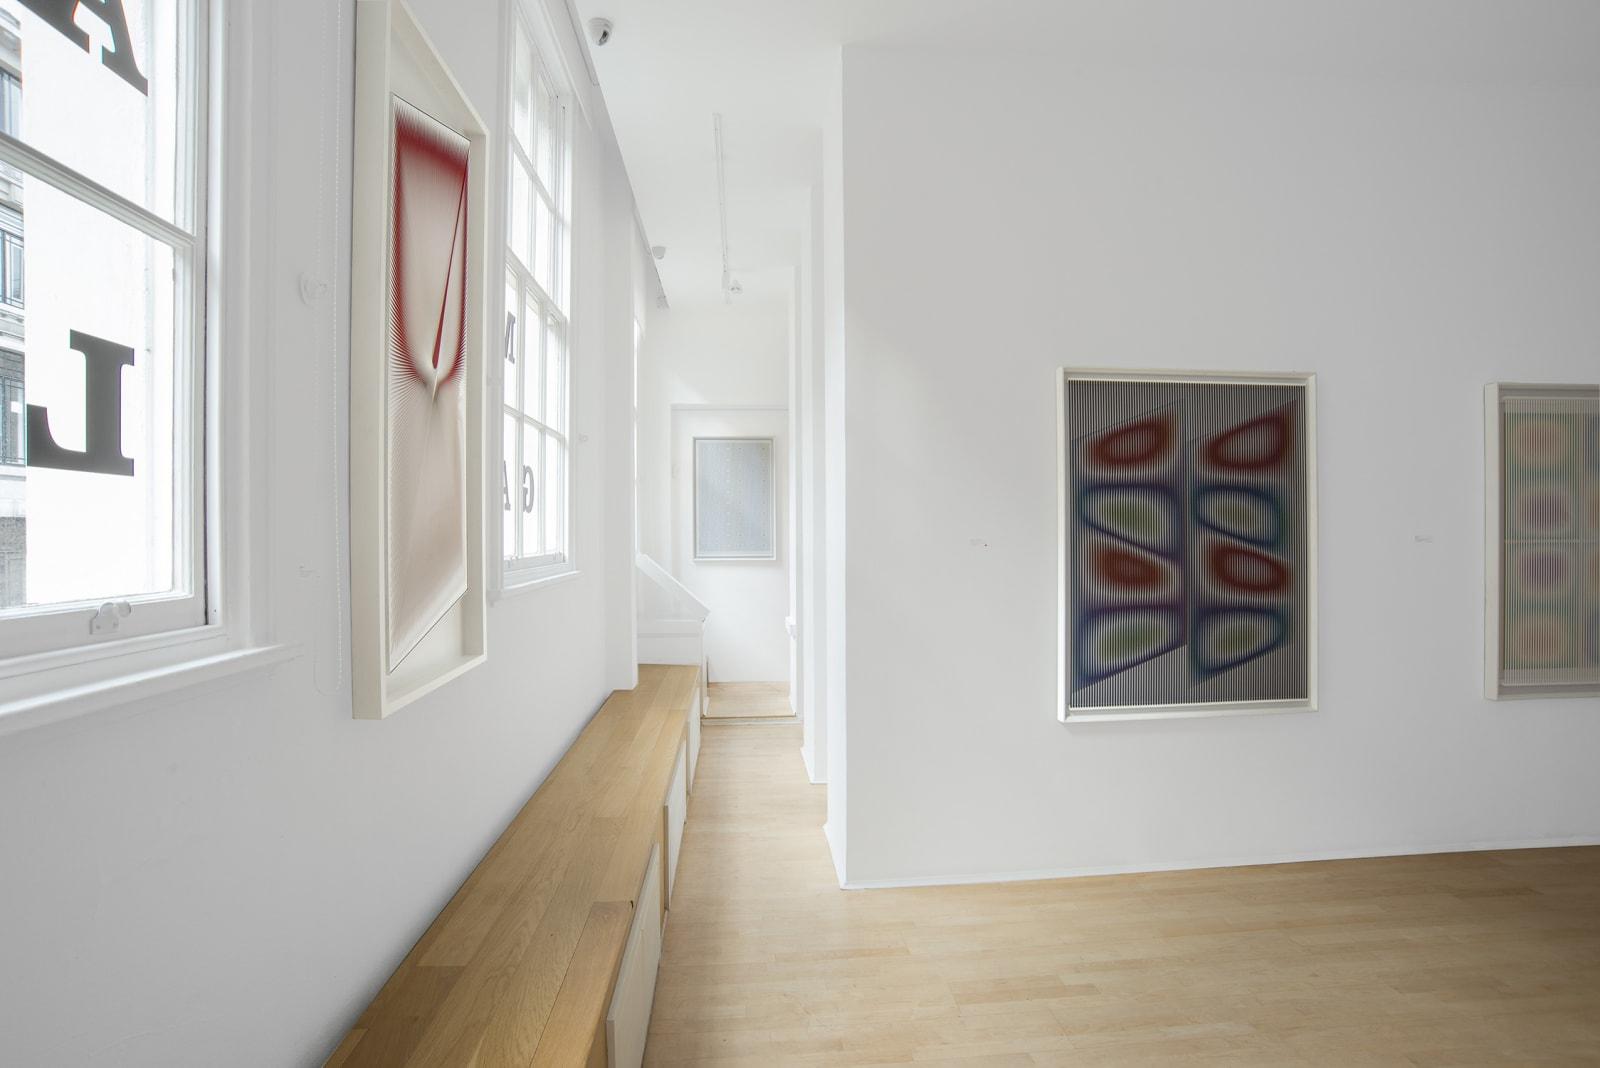 ALBERTO BIASI Installation View